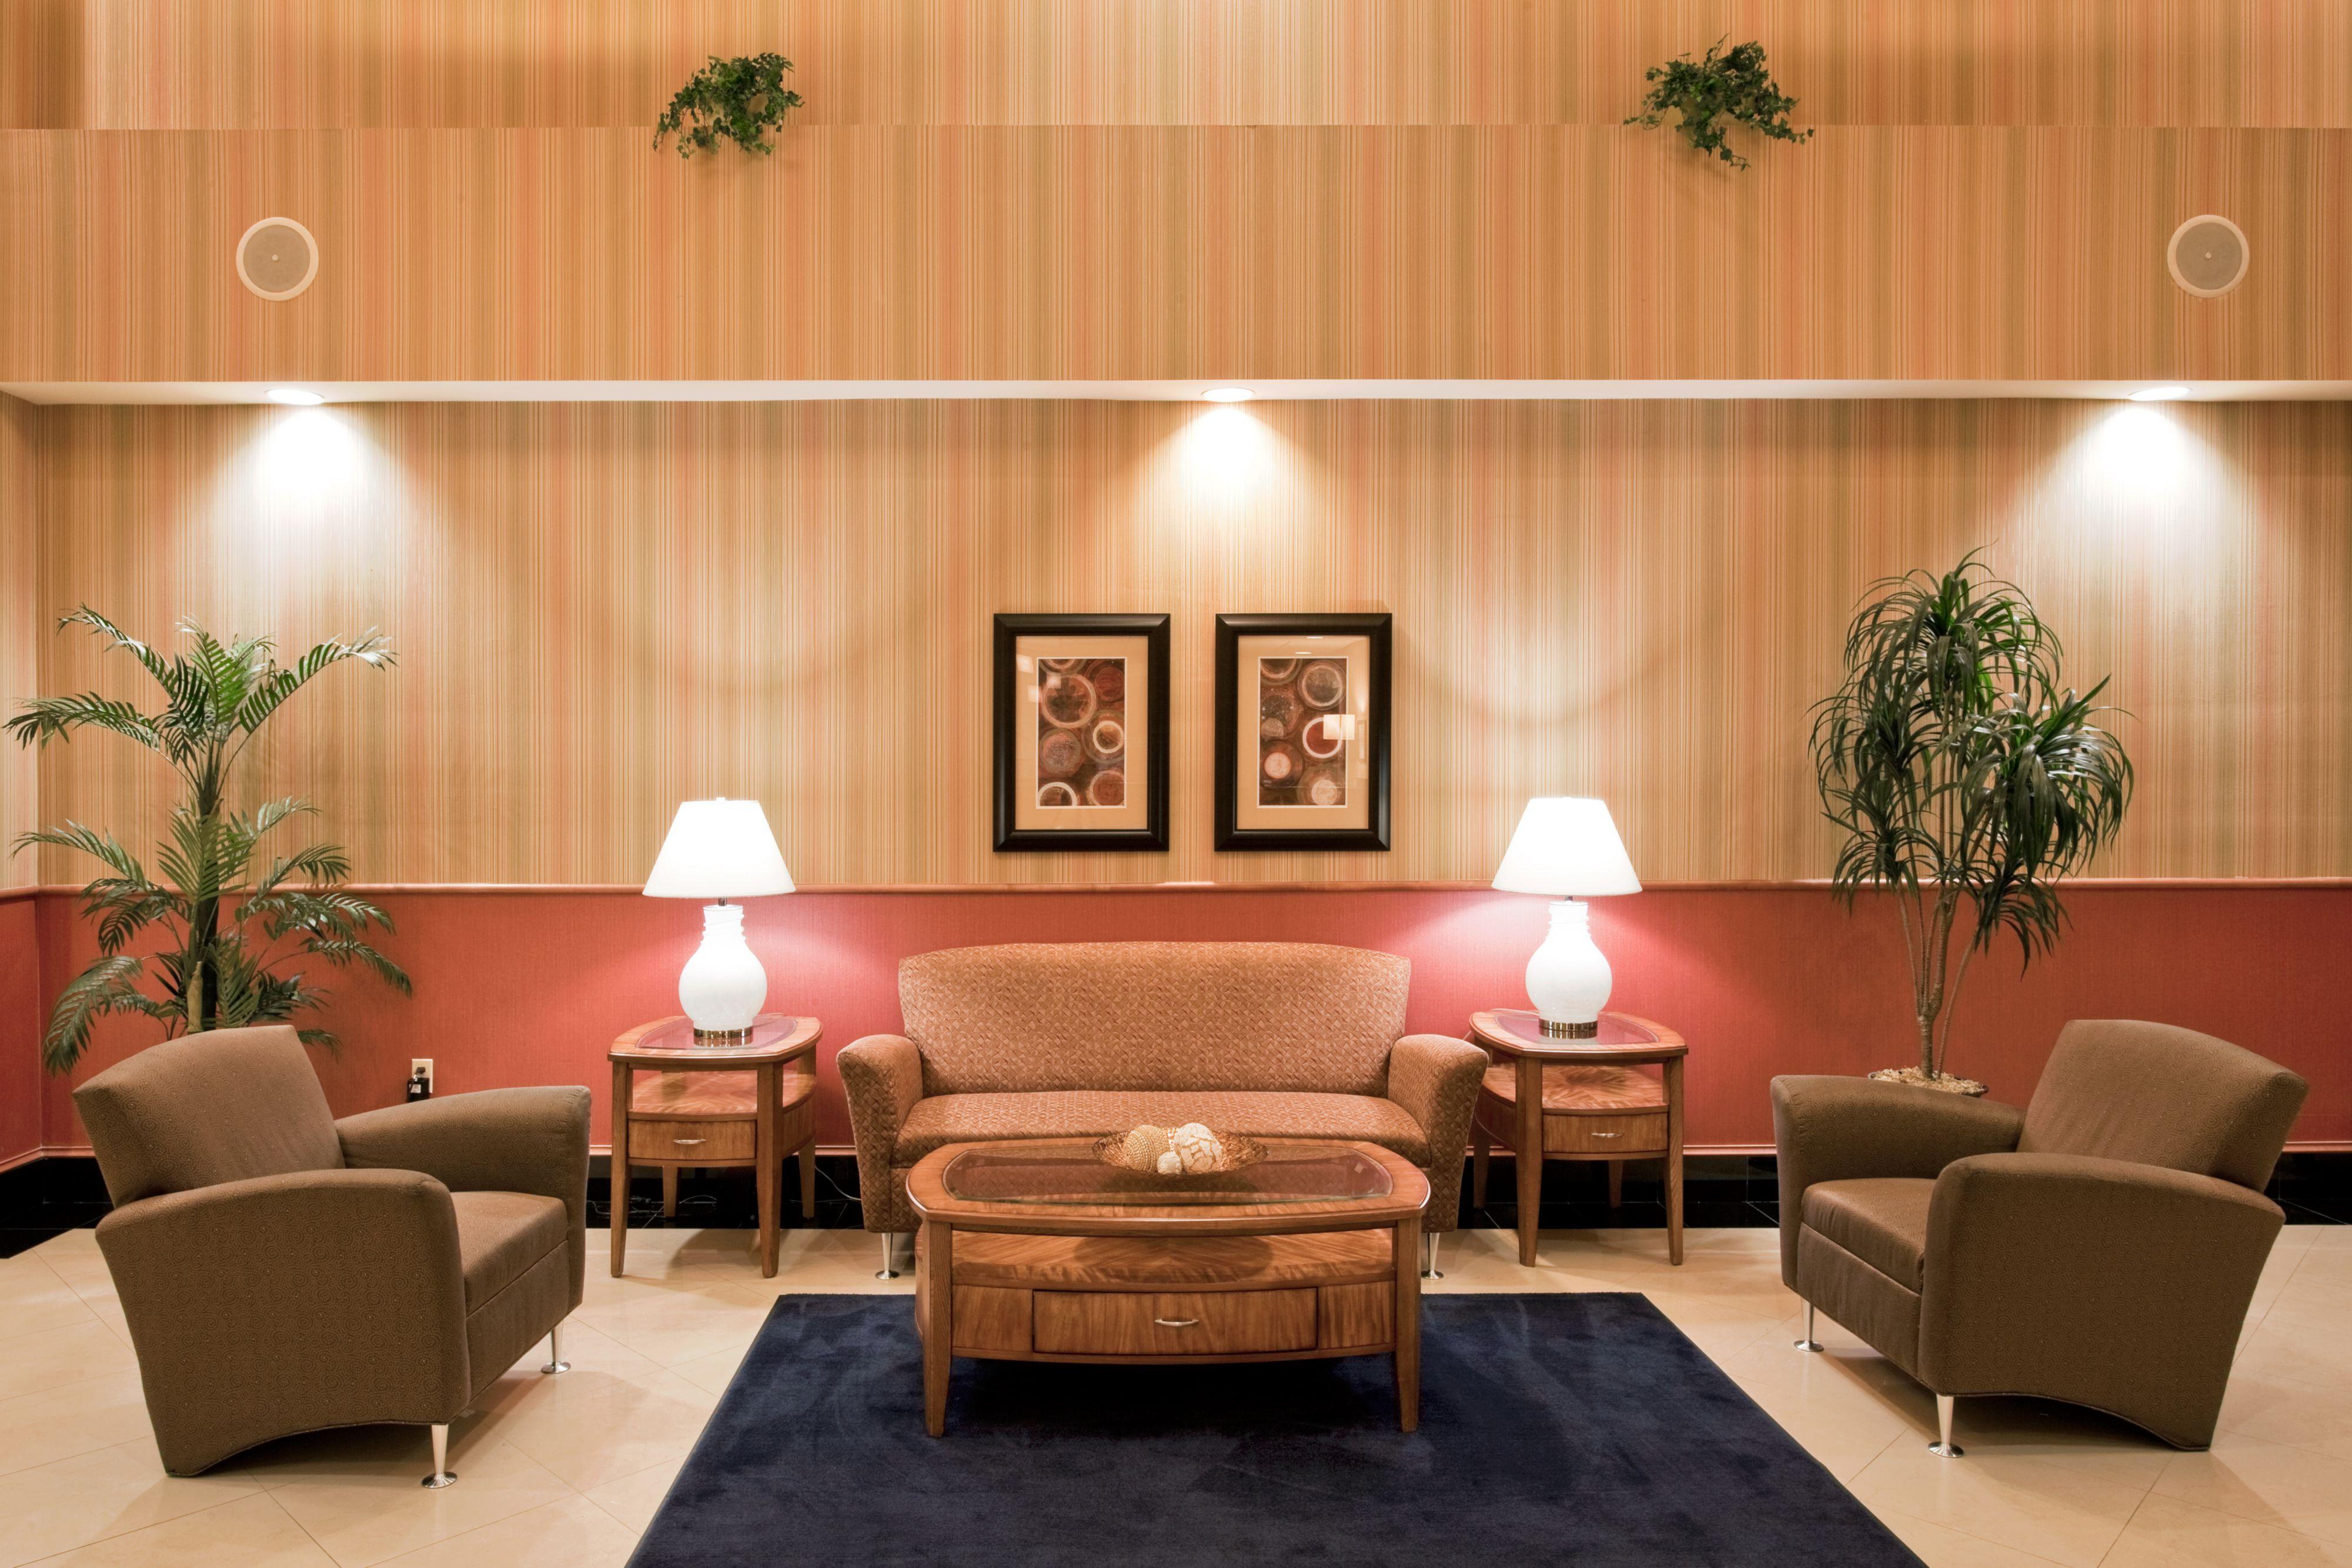 Holiday Inn Express & Suites Pembroke Pines-Sheridan St image 5